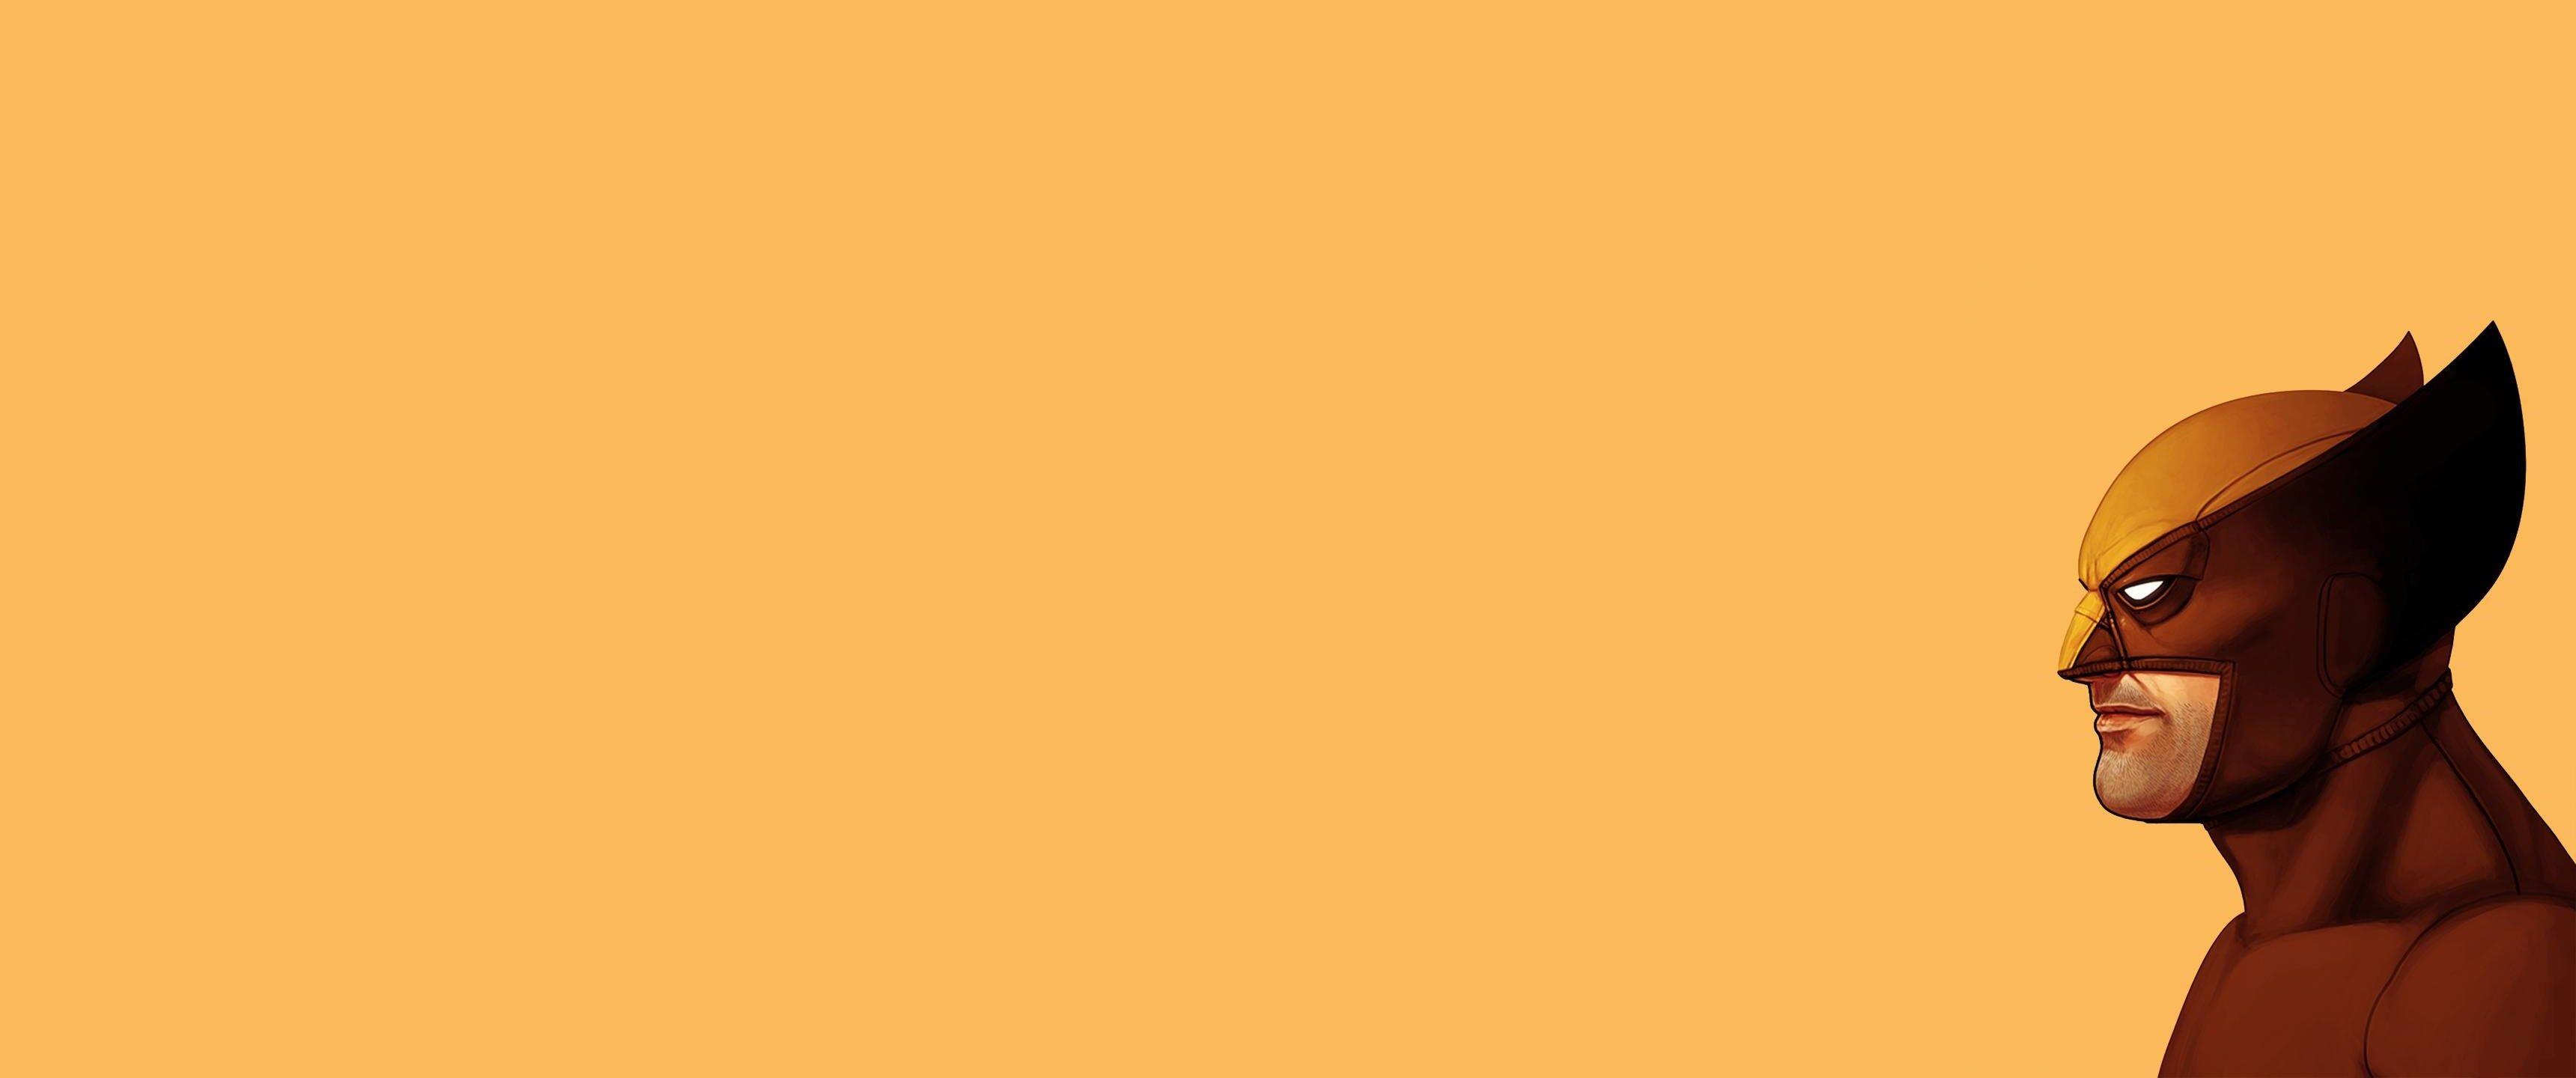 Great Wallpaper High Resolution Wolverine - 304b95aff87fe1f3e20f18e6dab27982  Pic_663831.jpg